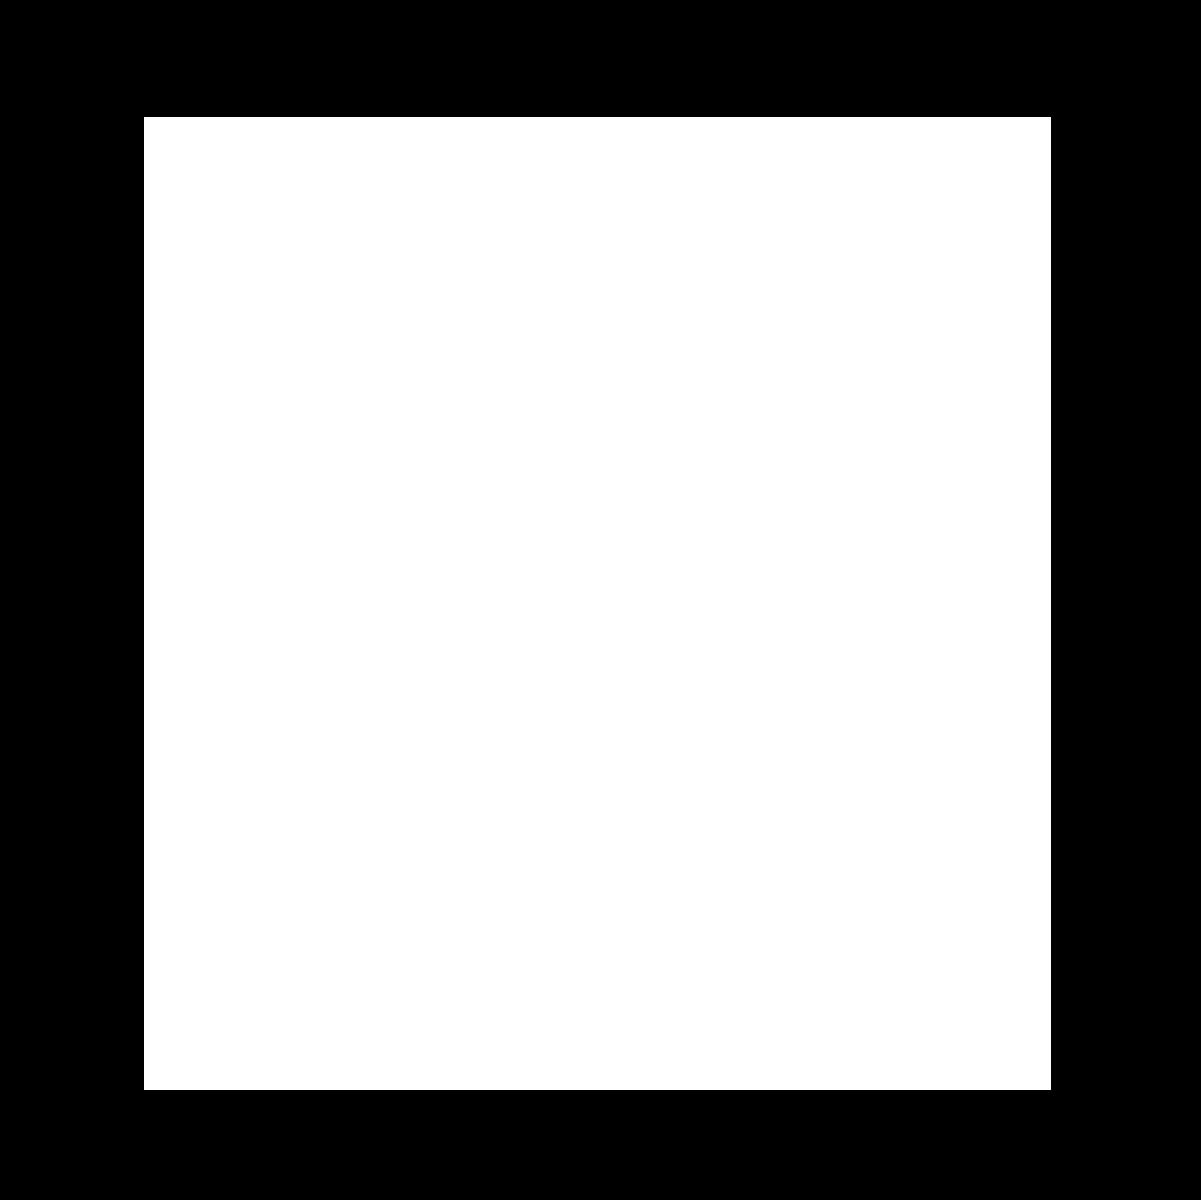 Wiechart Investment Properties